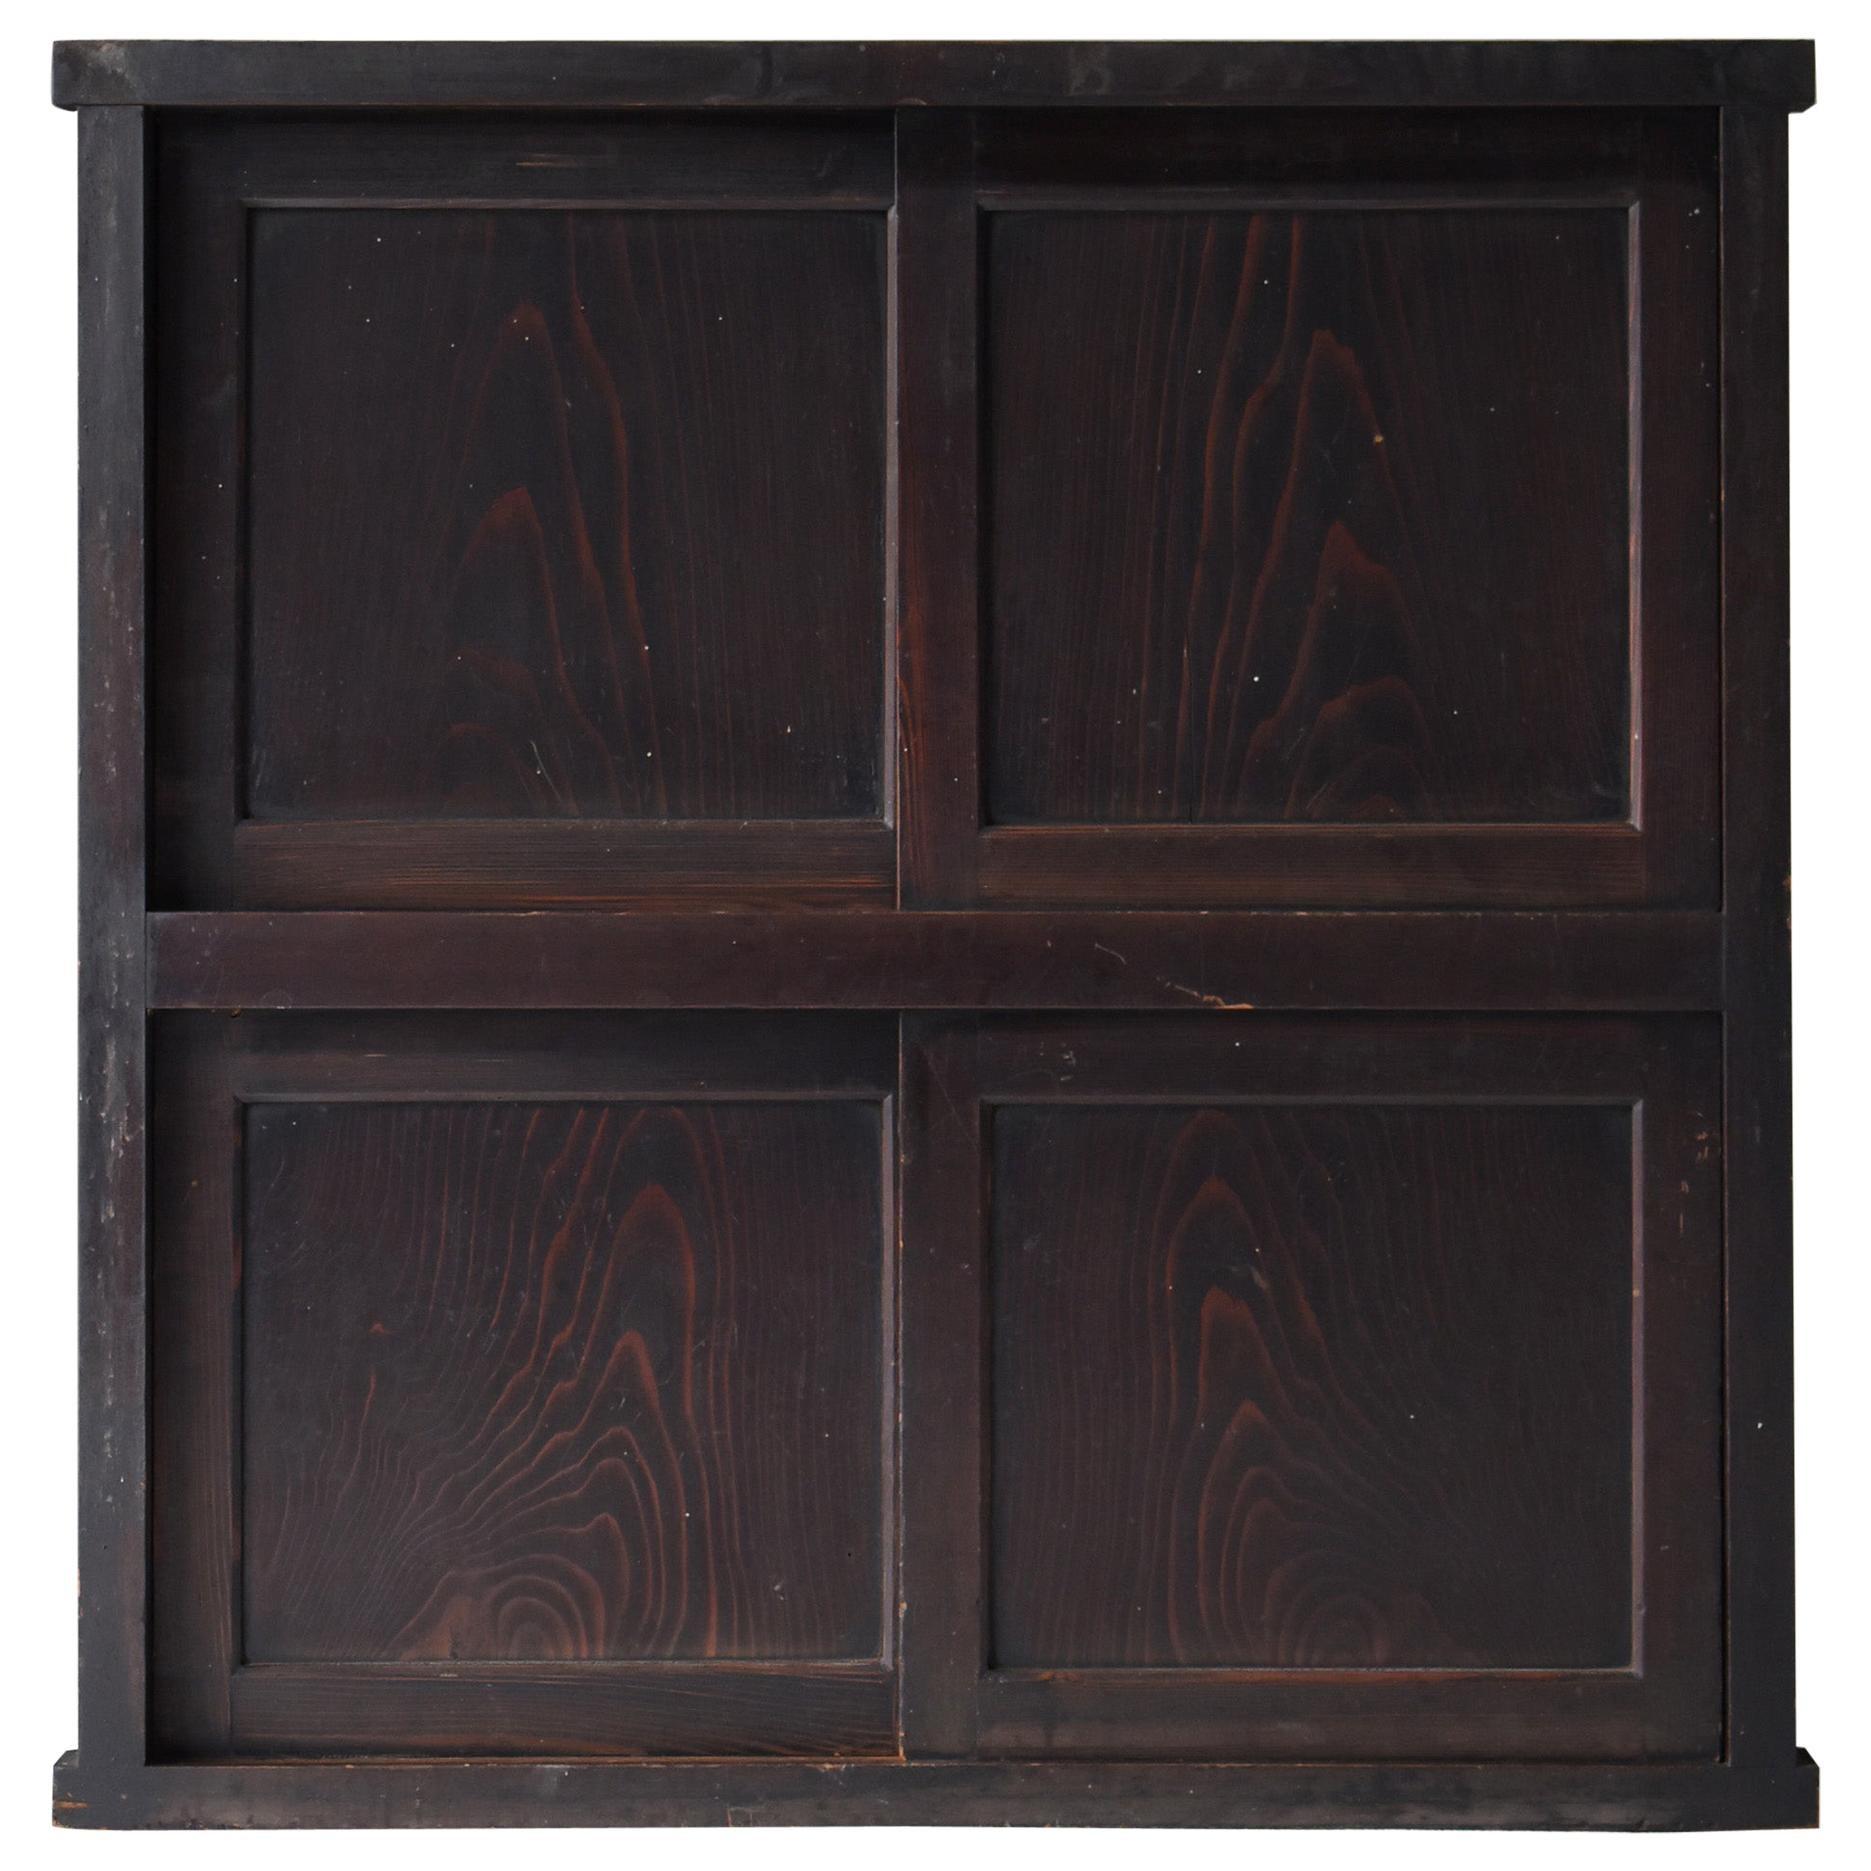 Japanese Antique Storage Shelf 1800s-1900s/Chest of Drawer Cabinet Tansu